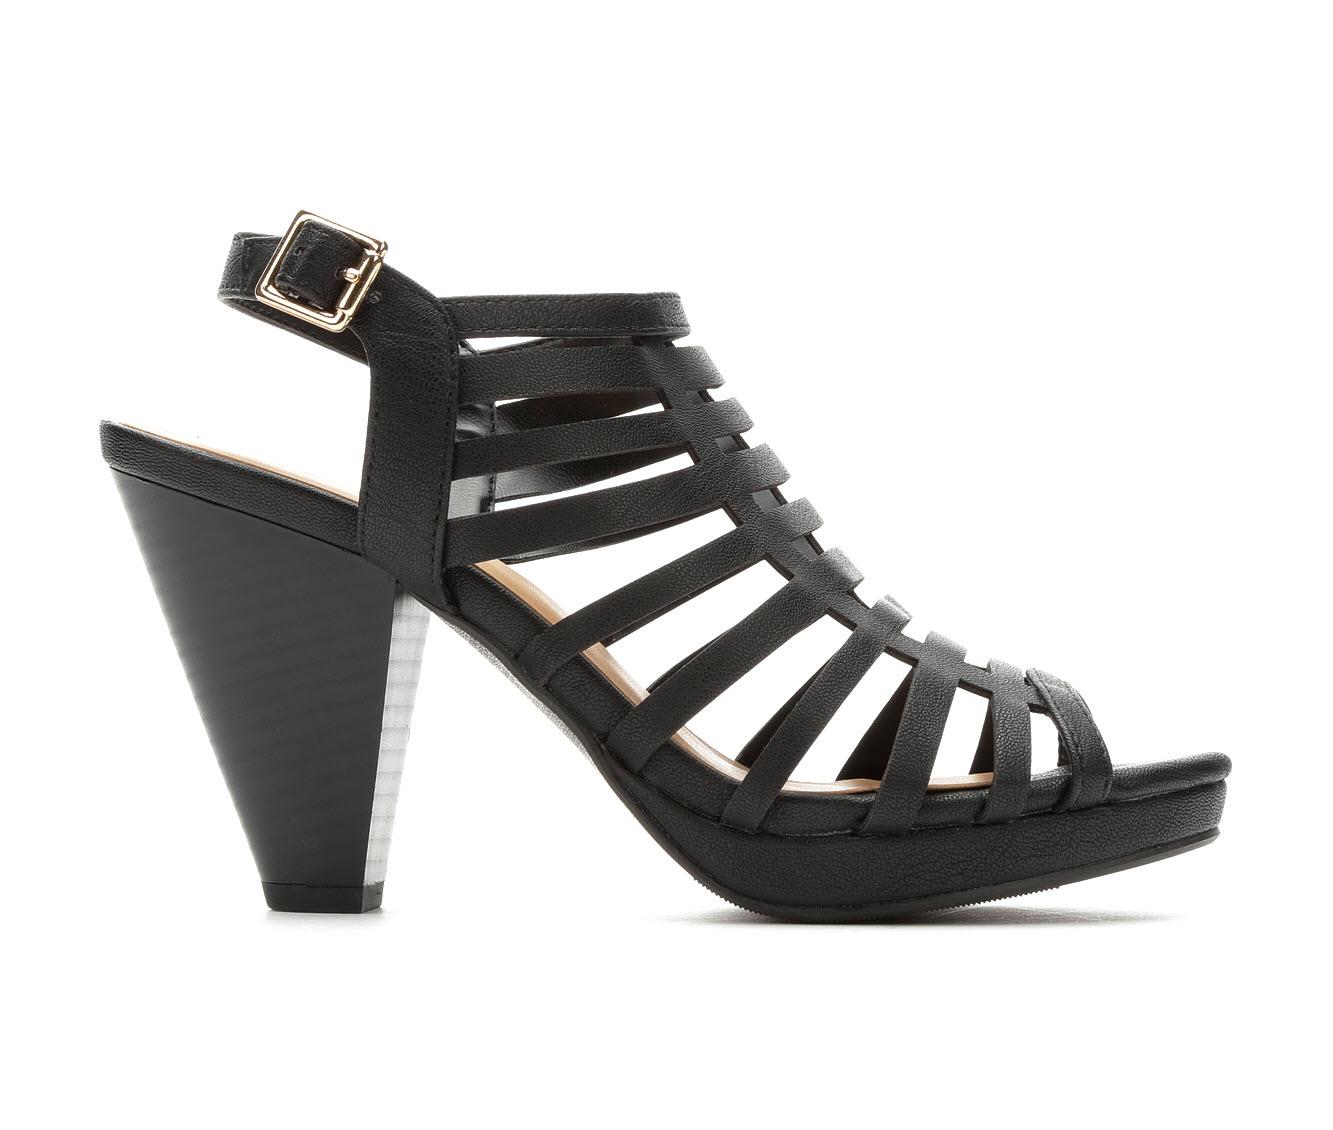 Solanz Kendall Women's Dress Shoe (Black Faux Leather)